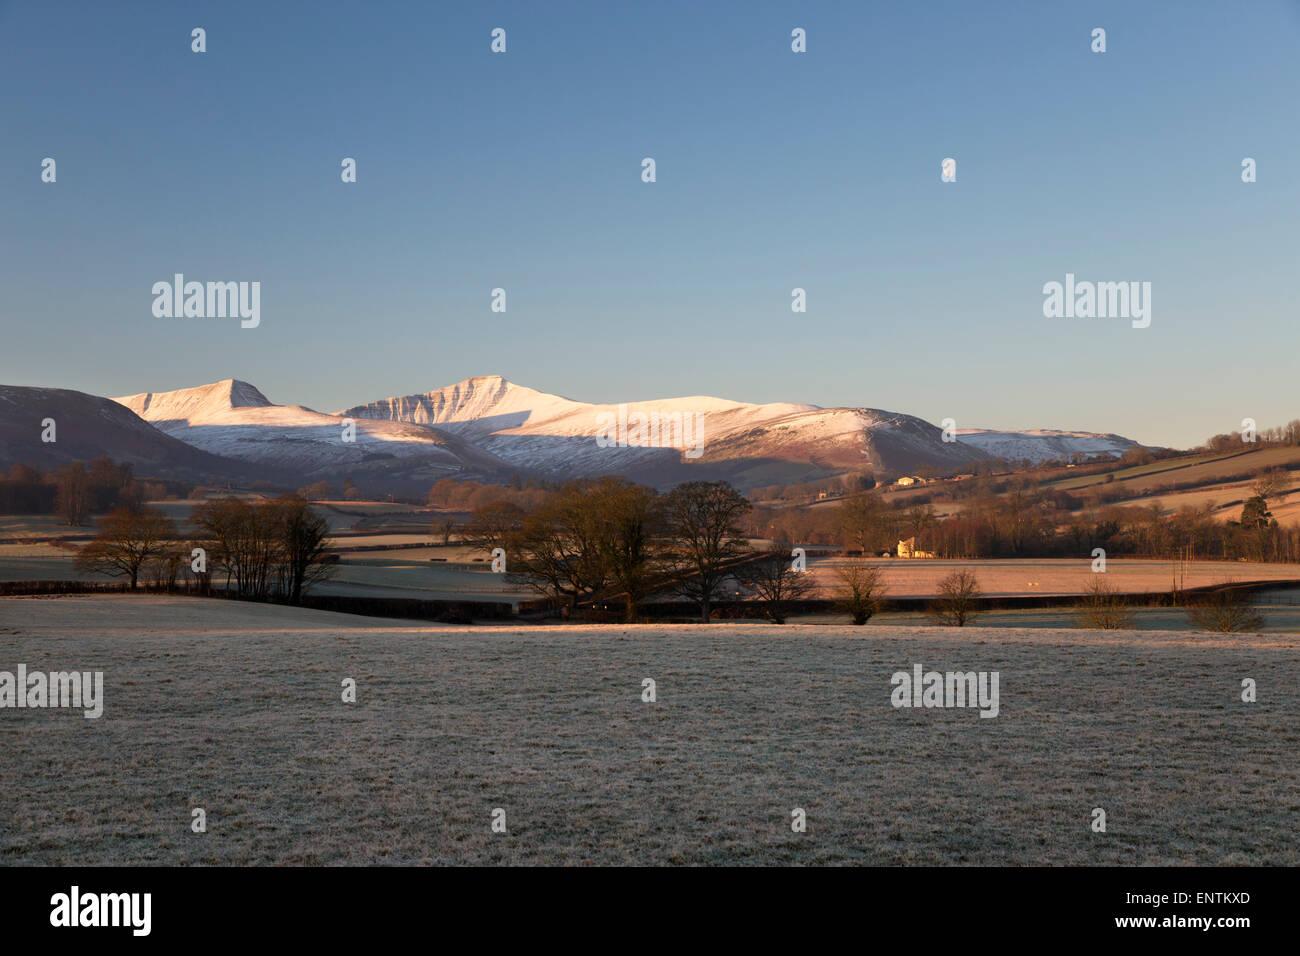 Schneebedeckte Gipfel des Pen y Fan in Morgen Frost, Llanfrynach, Usk Valley, Brecon Beacons National Park, Powys, Stockbild